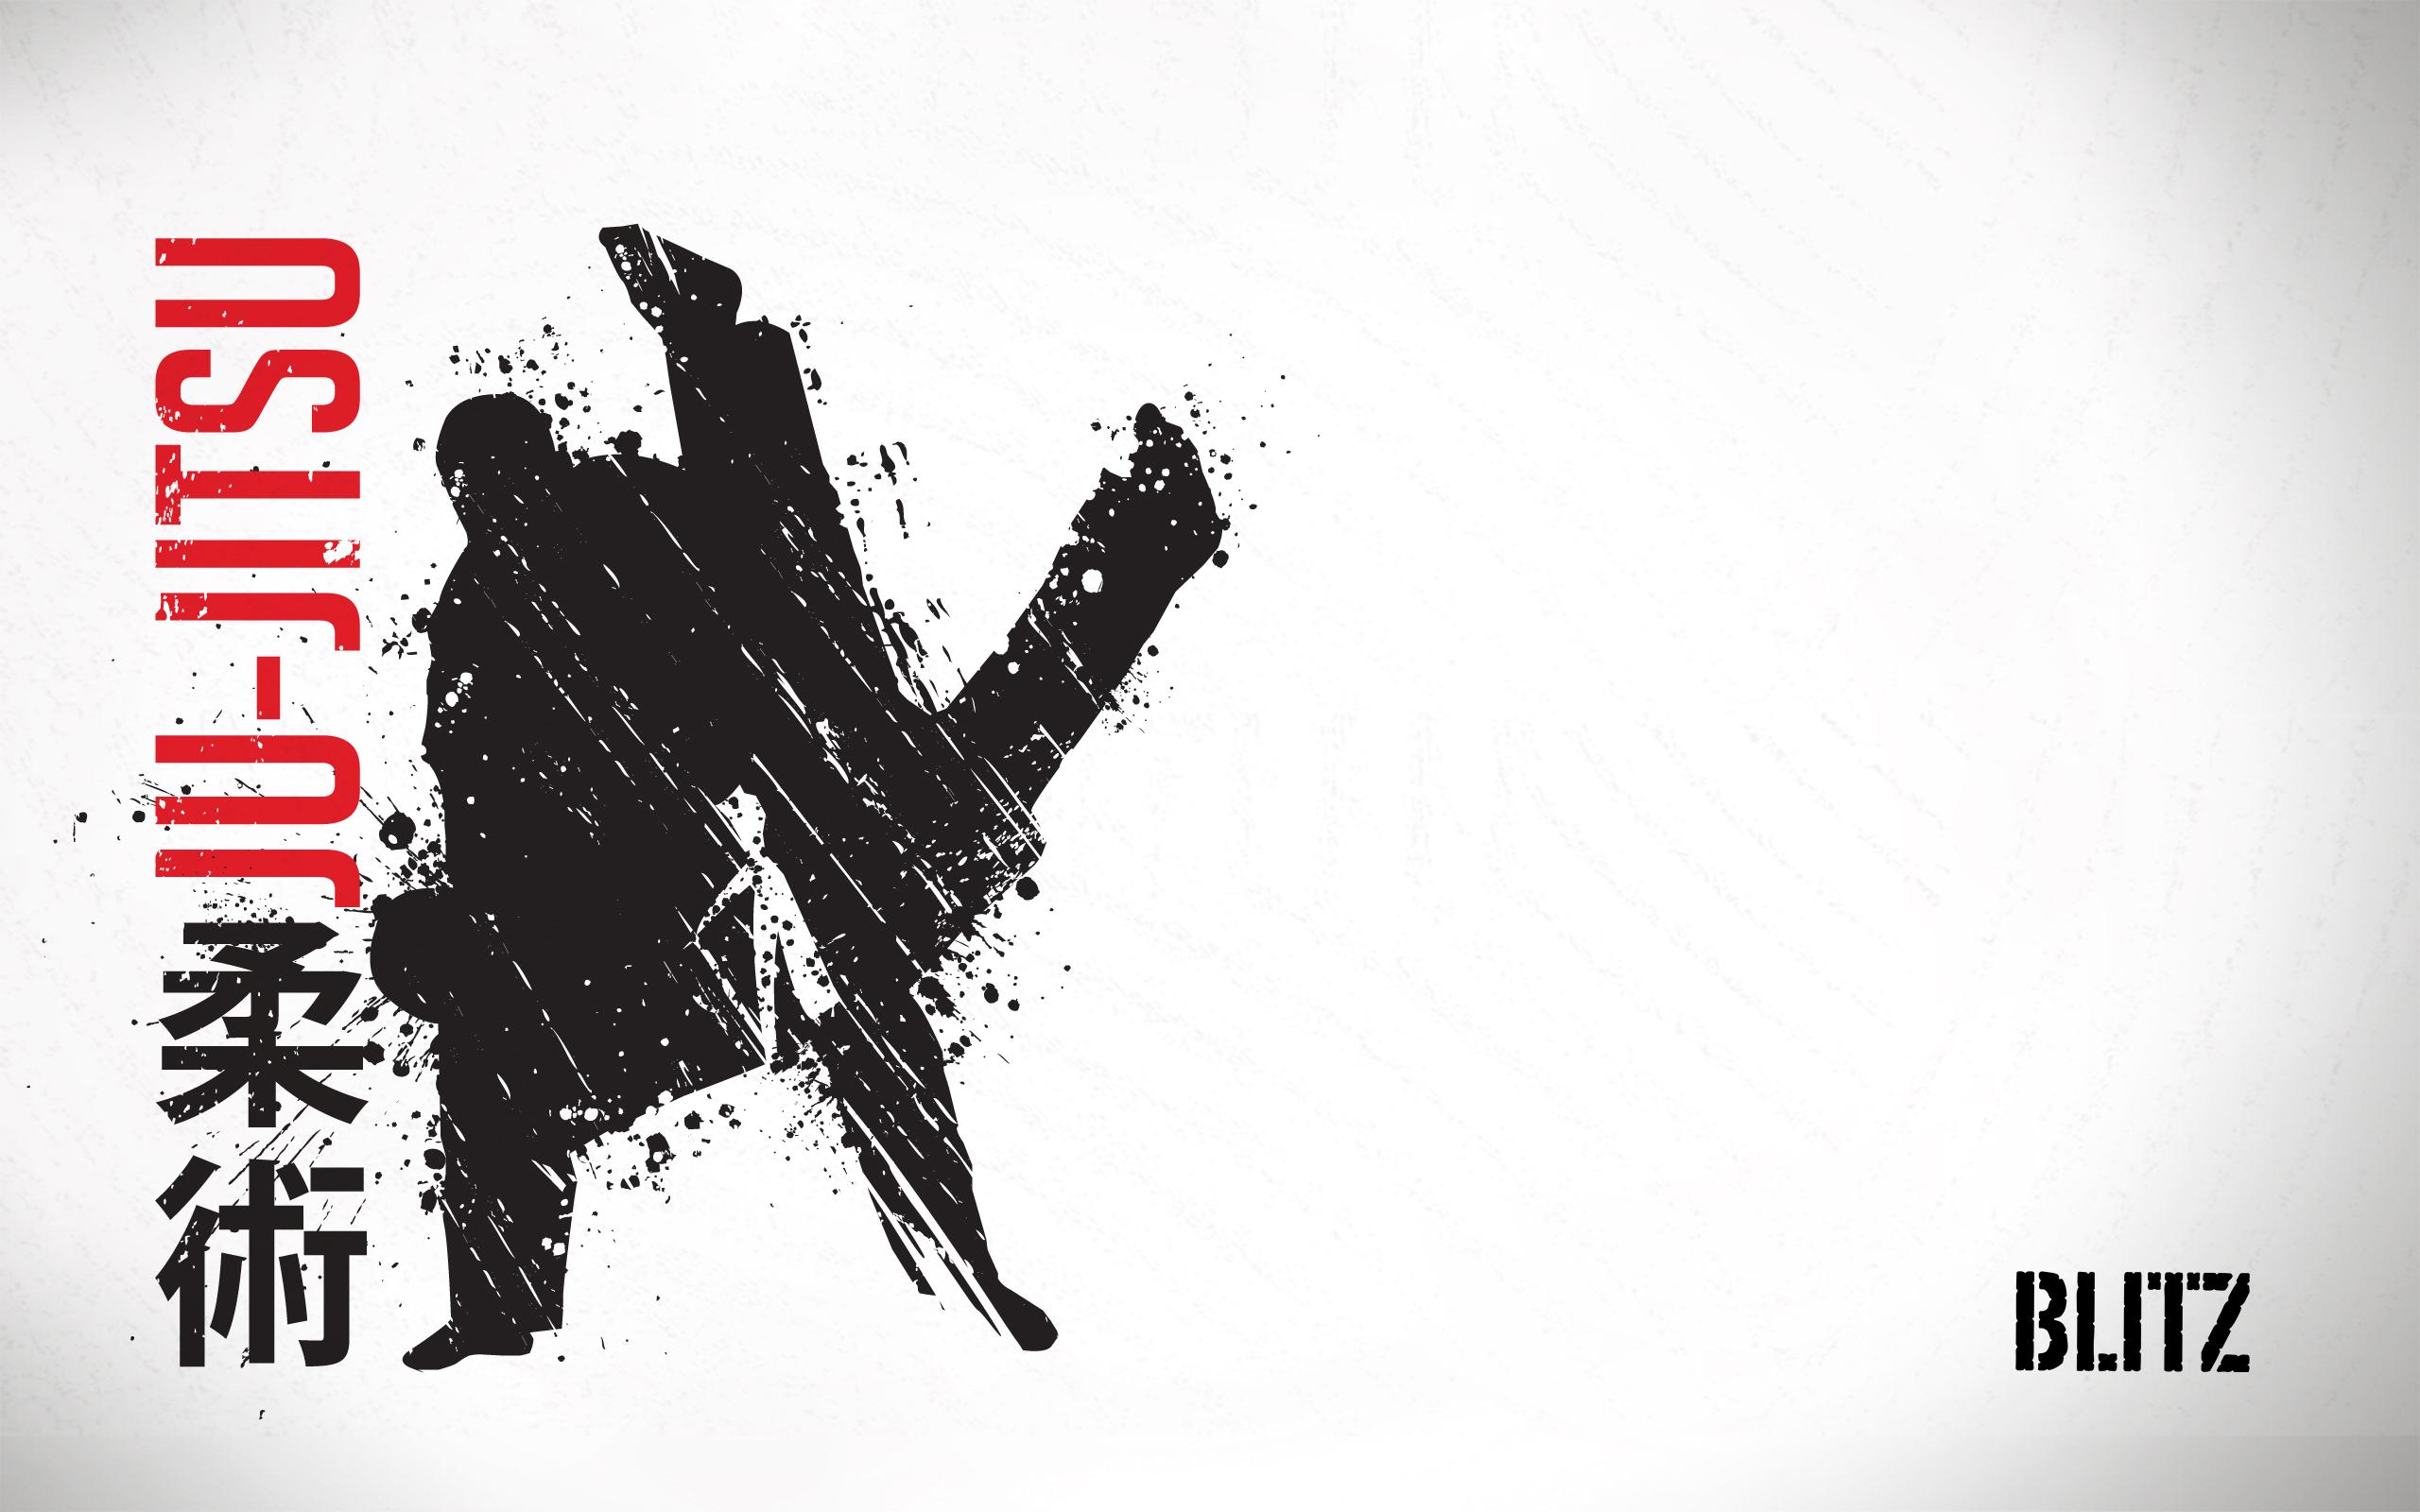 Blitz Sport Jujitsu Wallpaper 2560x1600jpg 25602151600 2560x1600